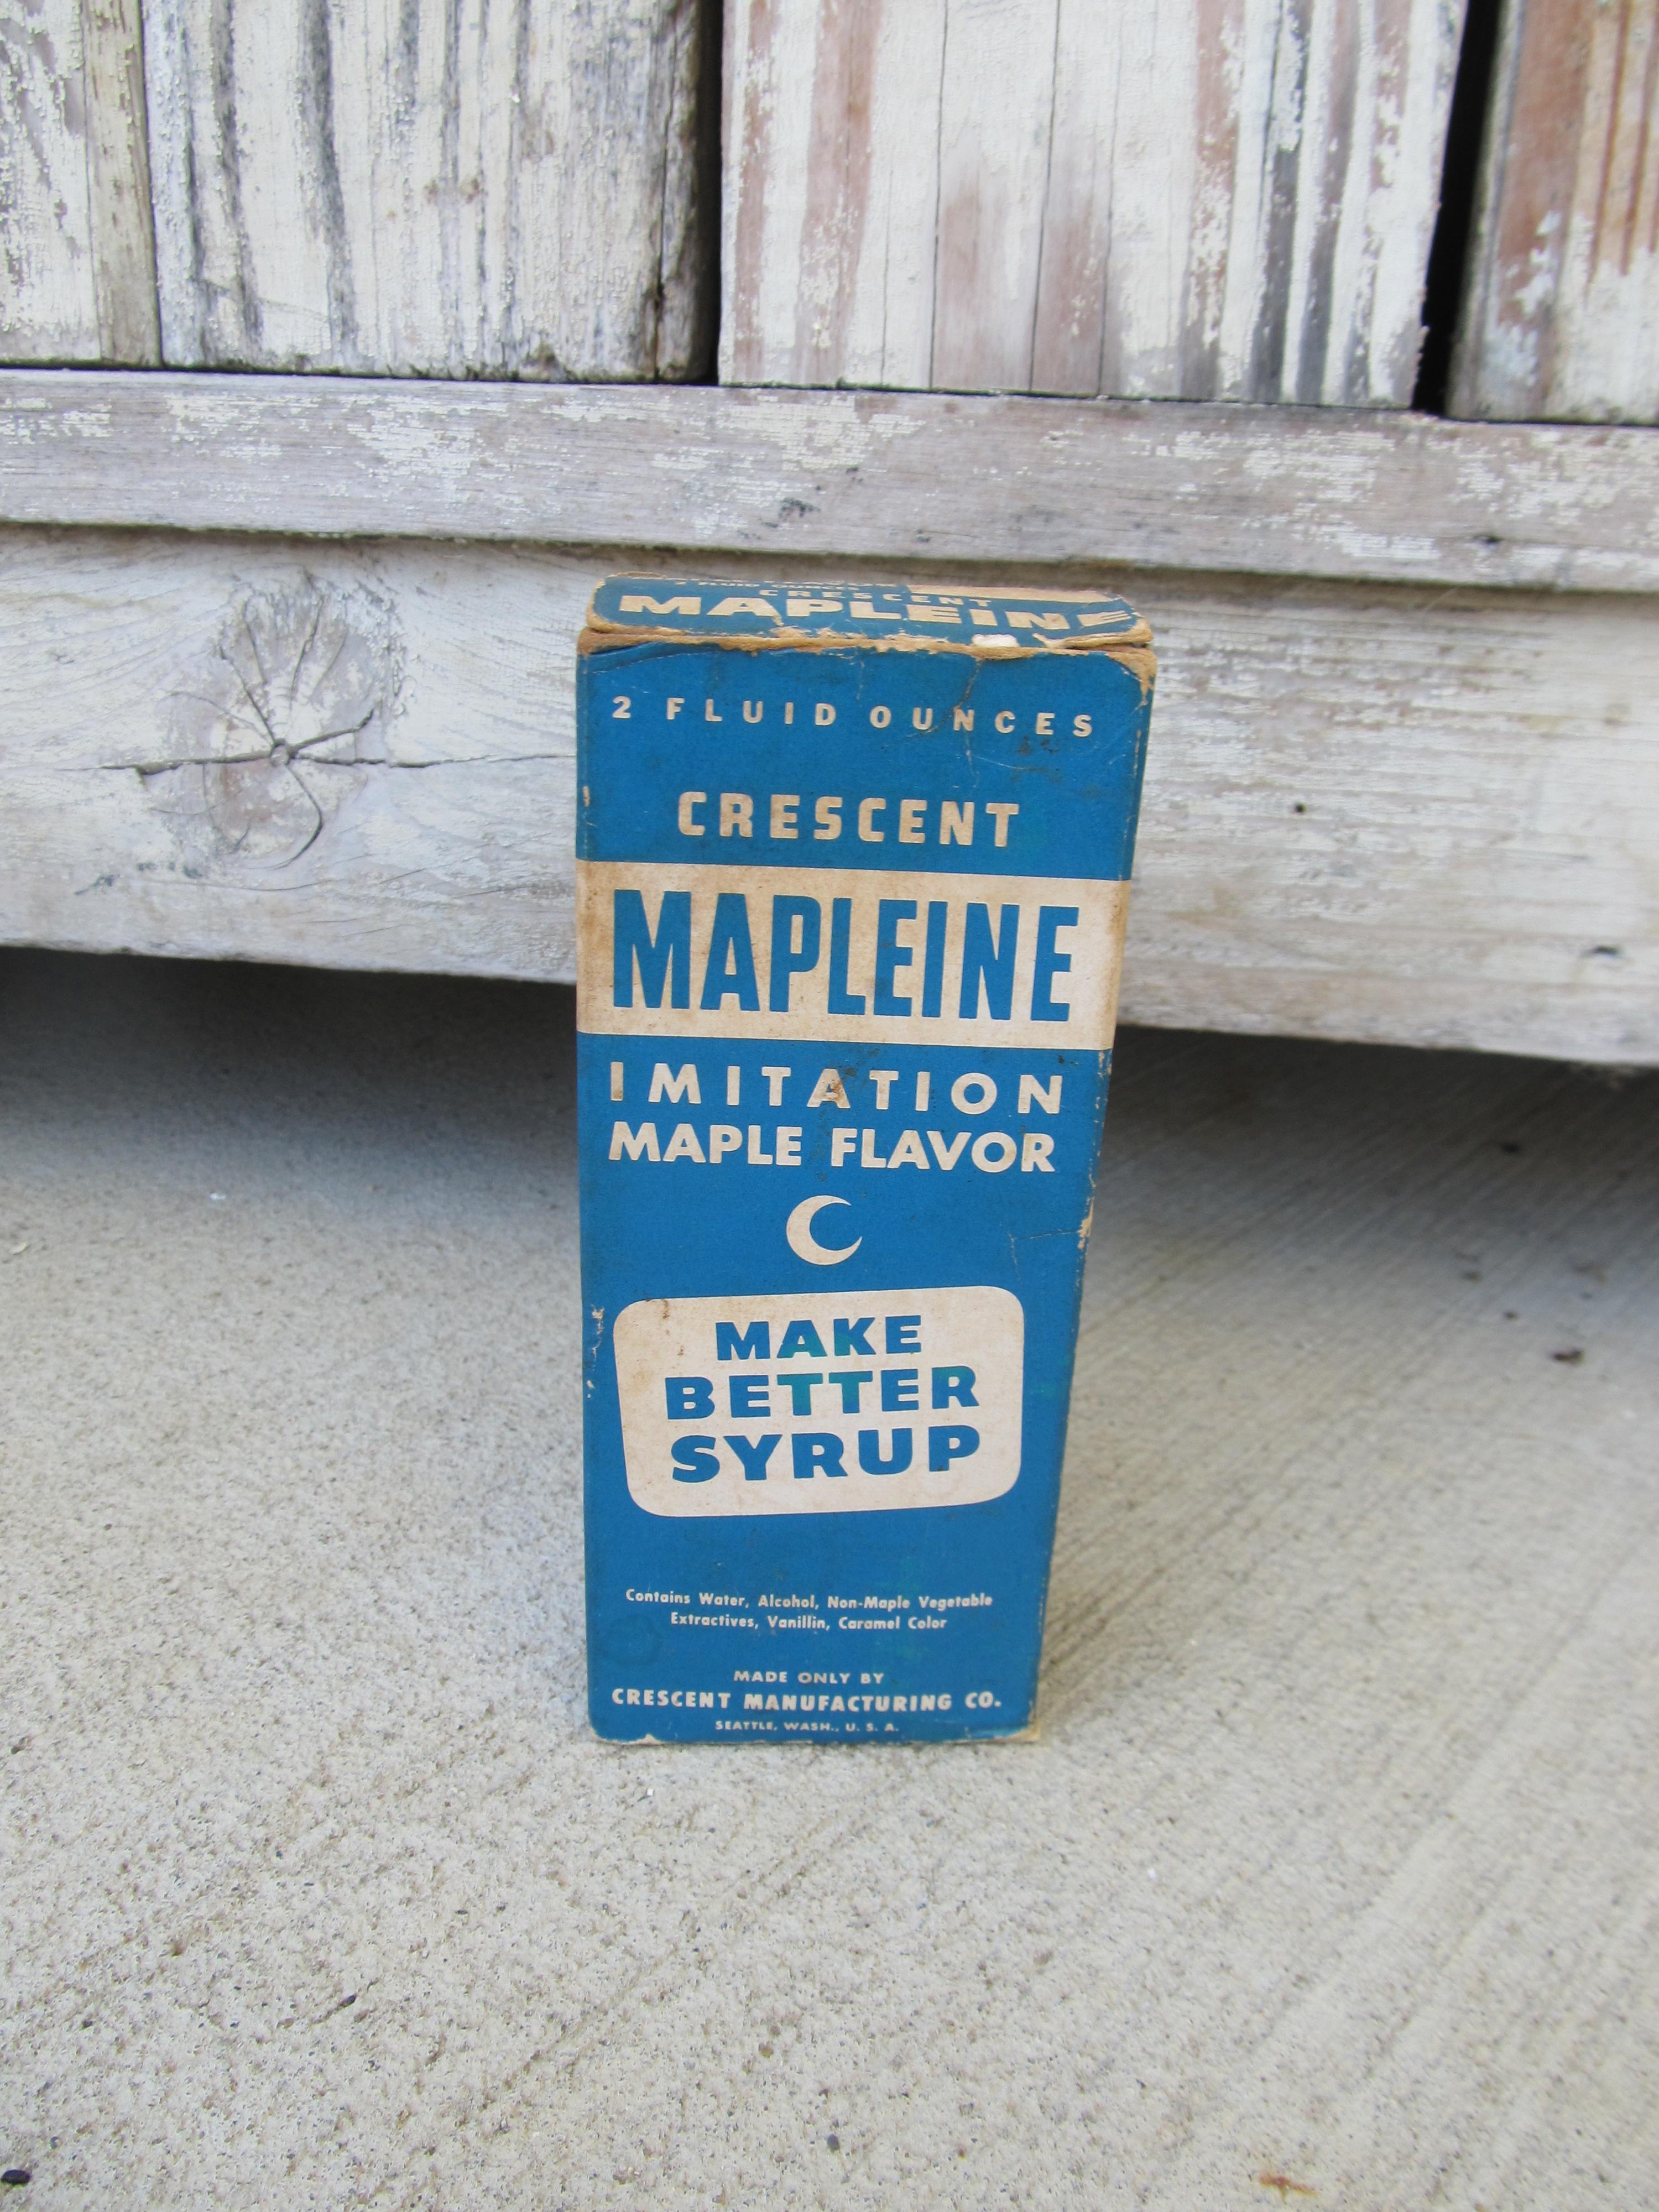 Vintage Antique Crescent Brand Mapleine Imitation Maple Flavor Glass Bottle  and Box